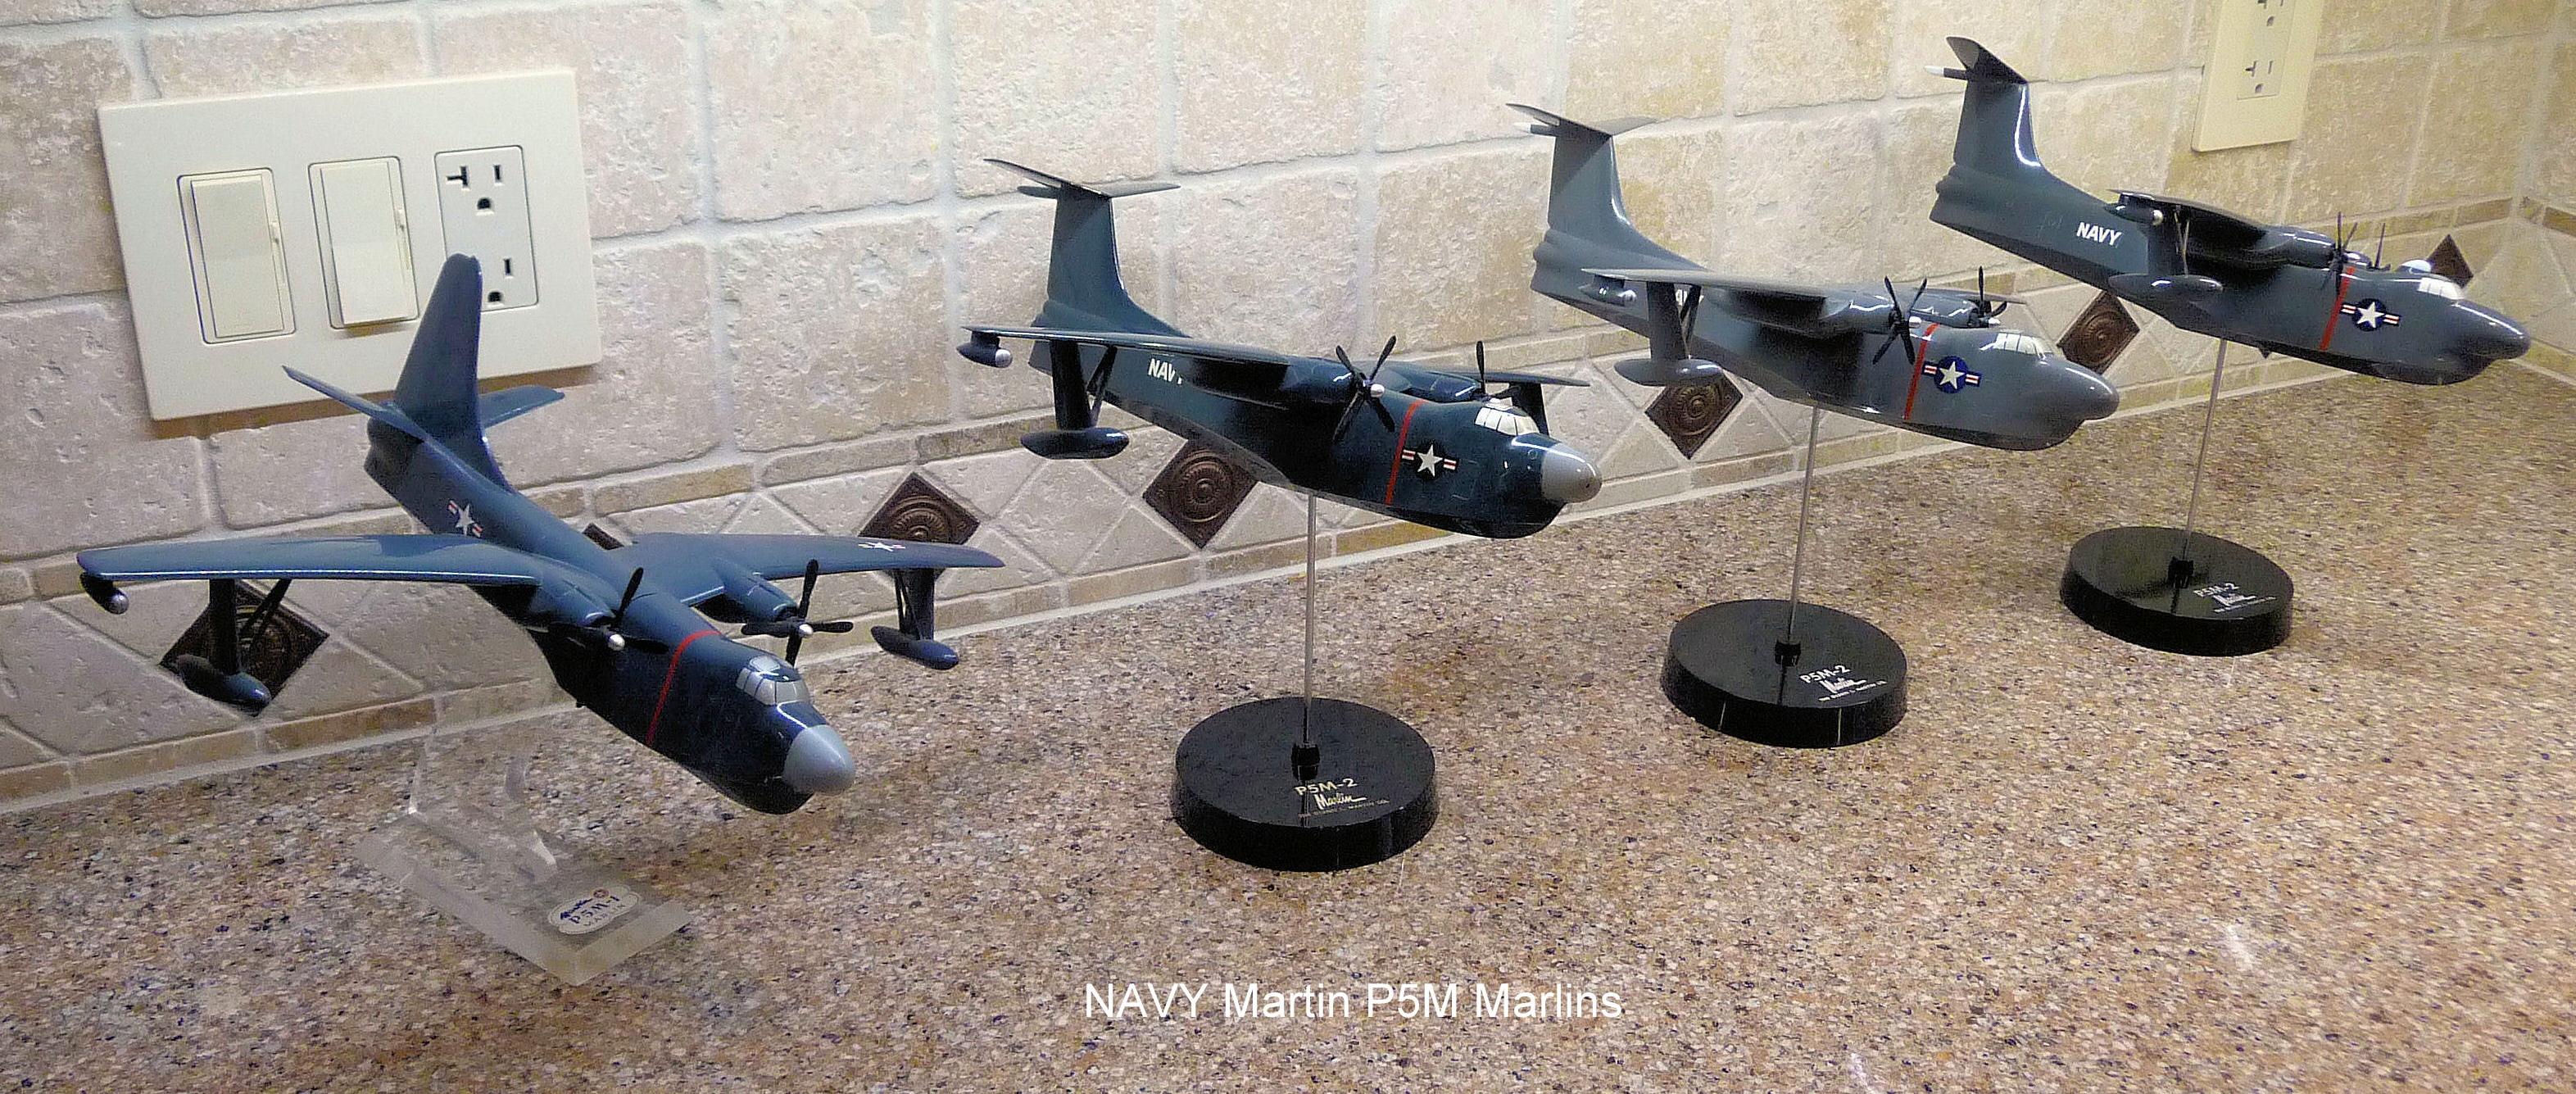 Martin P5M Martins